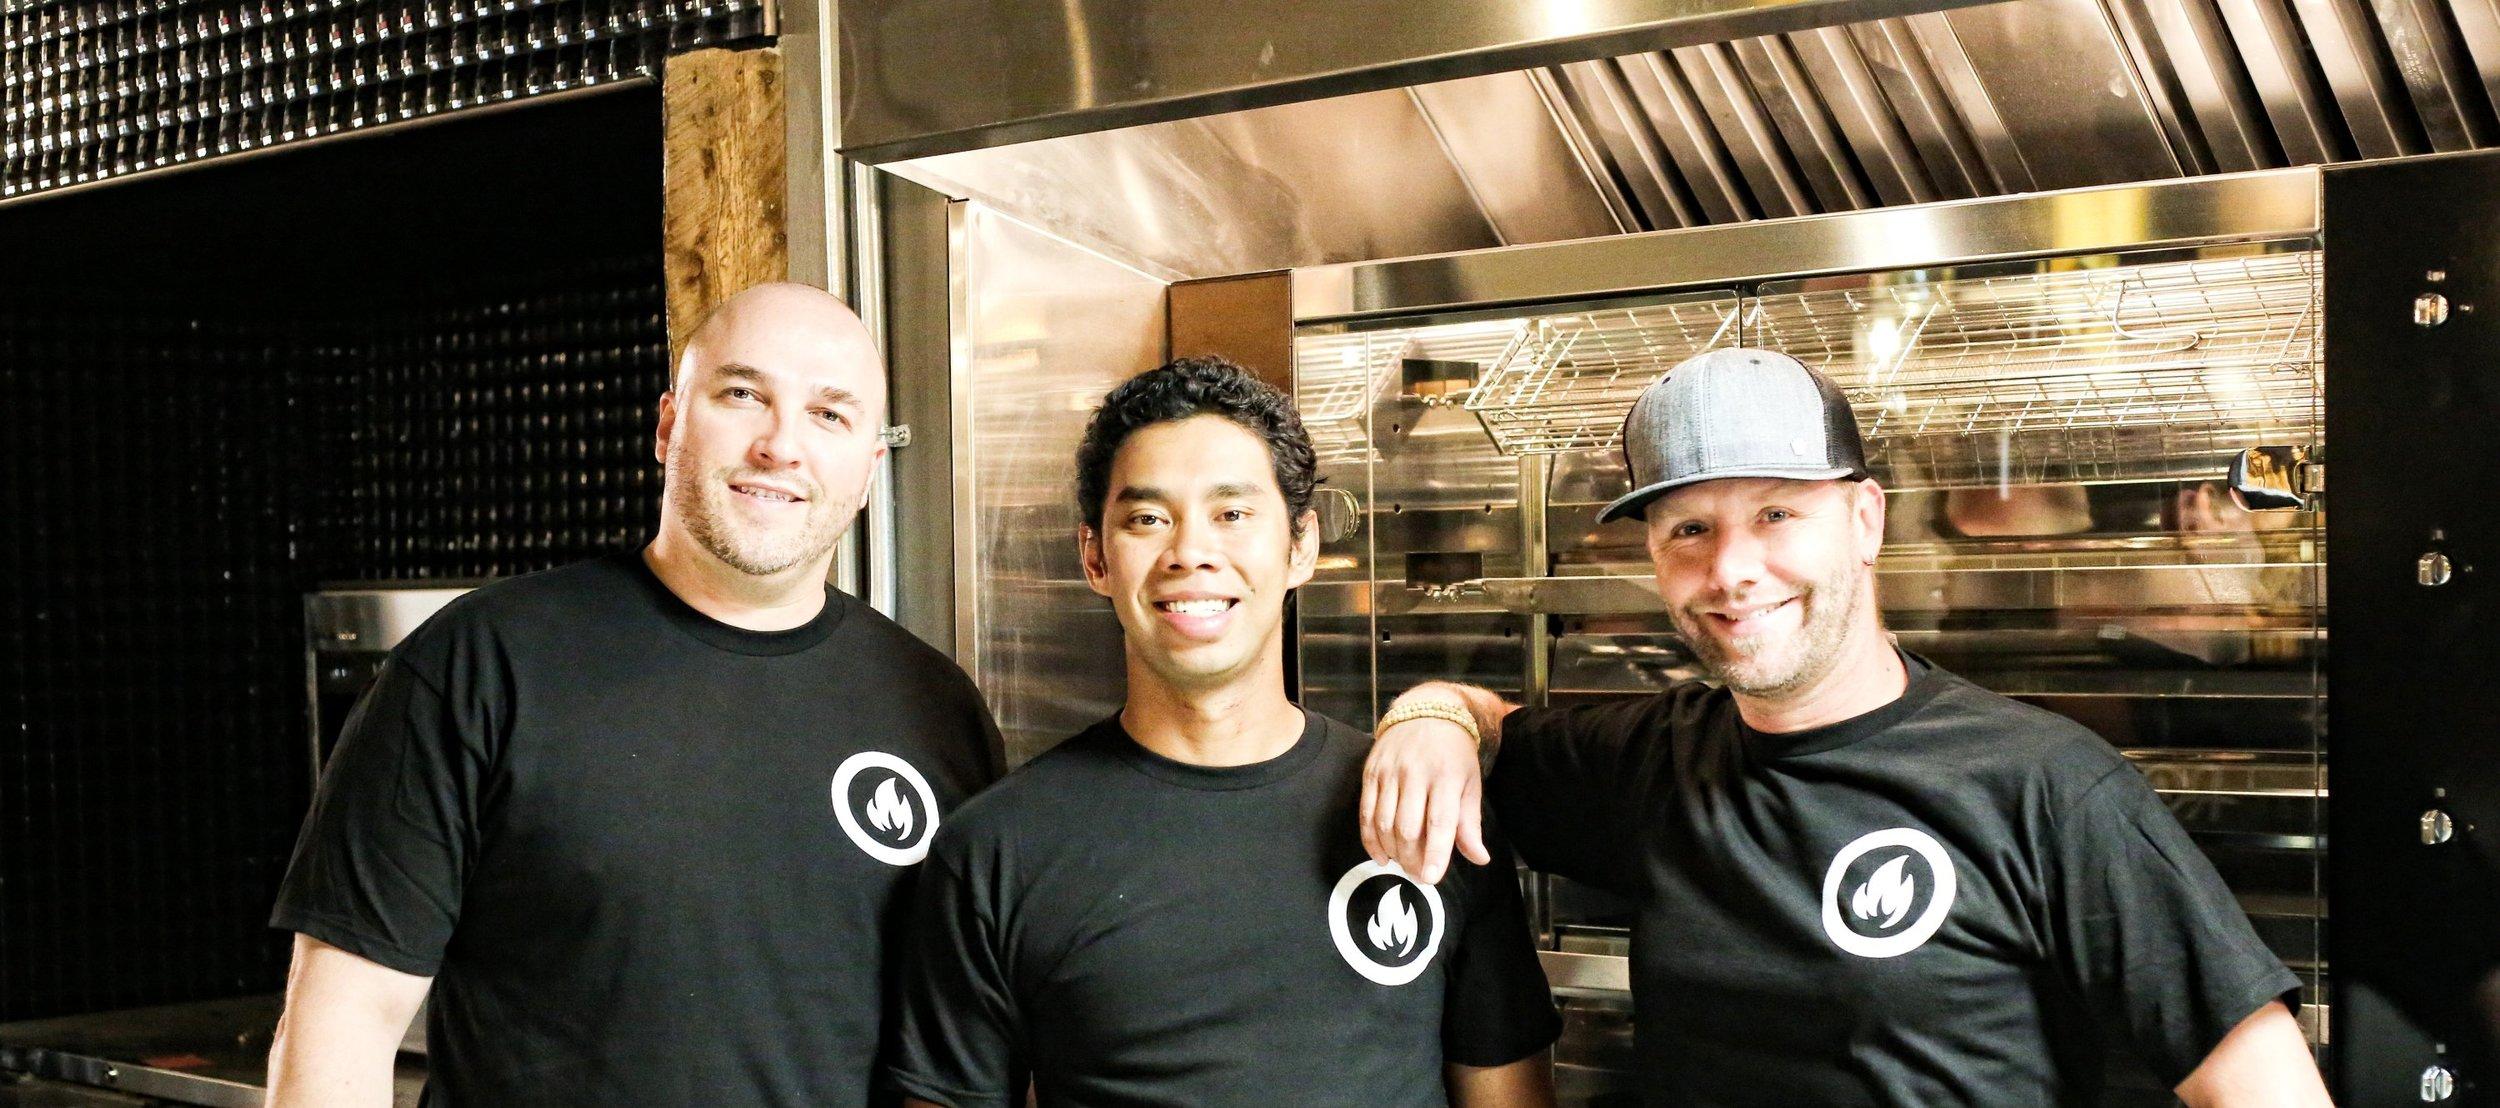 Dani Braun, Chef Edgar Gutierrez, and Chris Sills, Rostizado, Mercer Warehouse